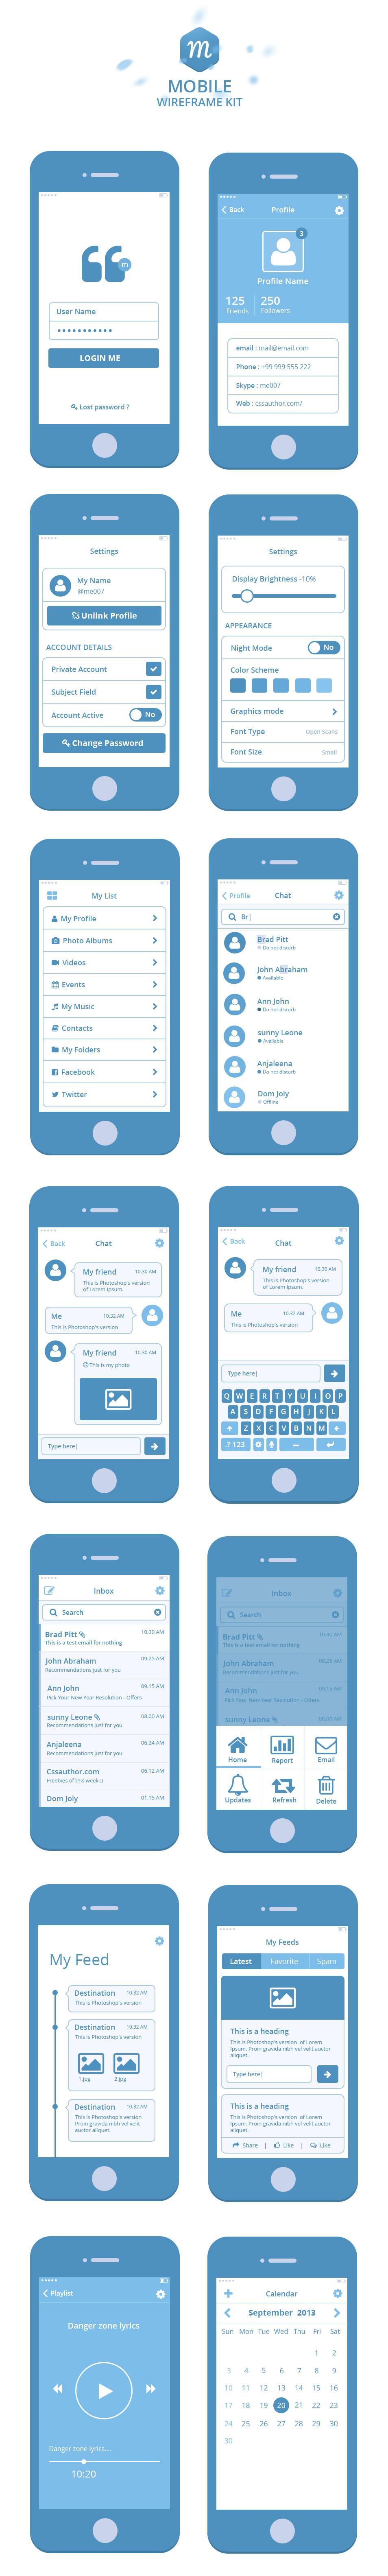 Mobile-Wireframe-Kit-PSD